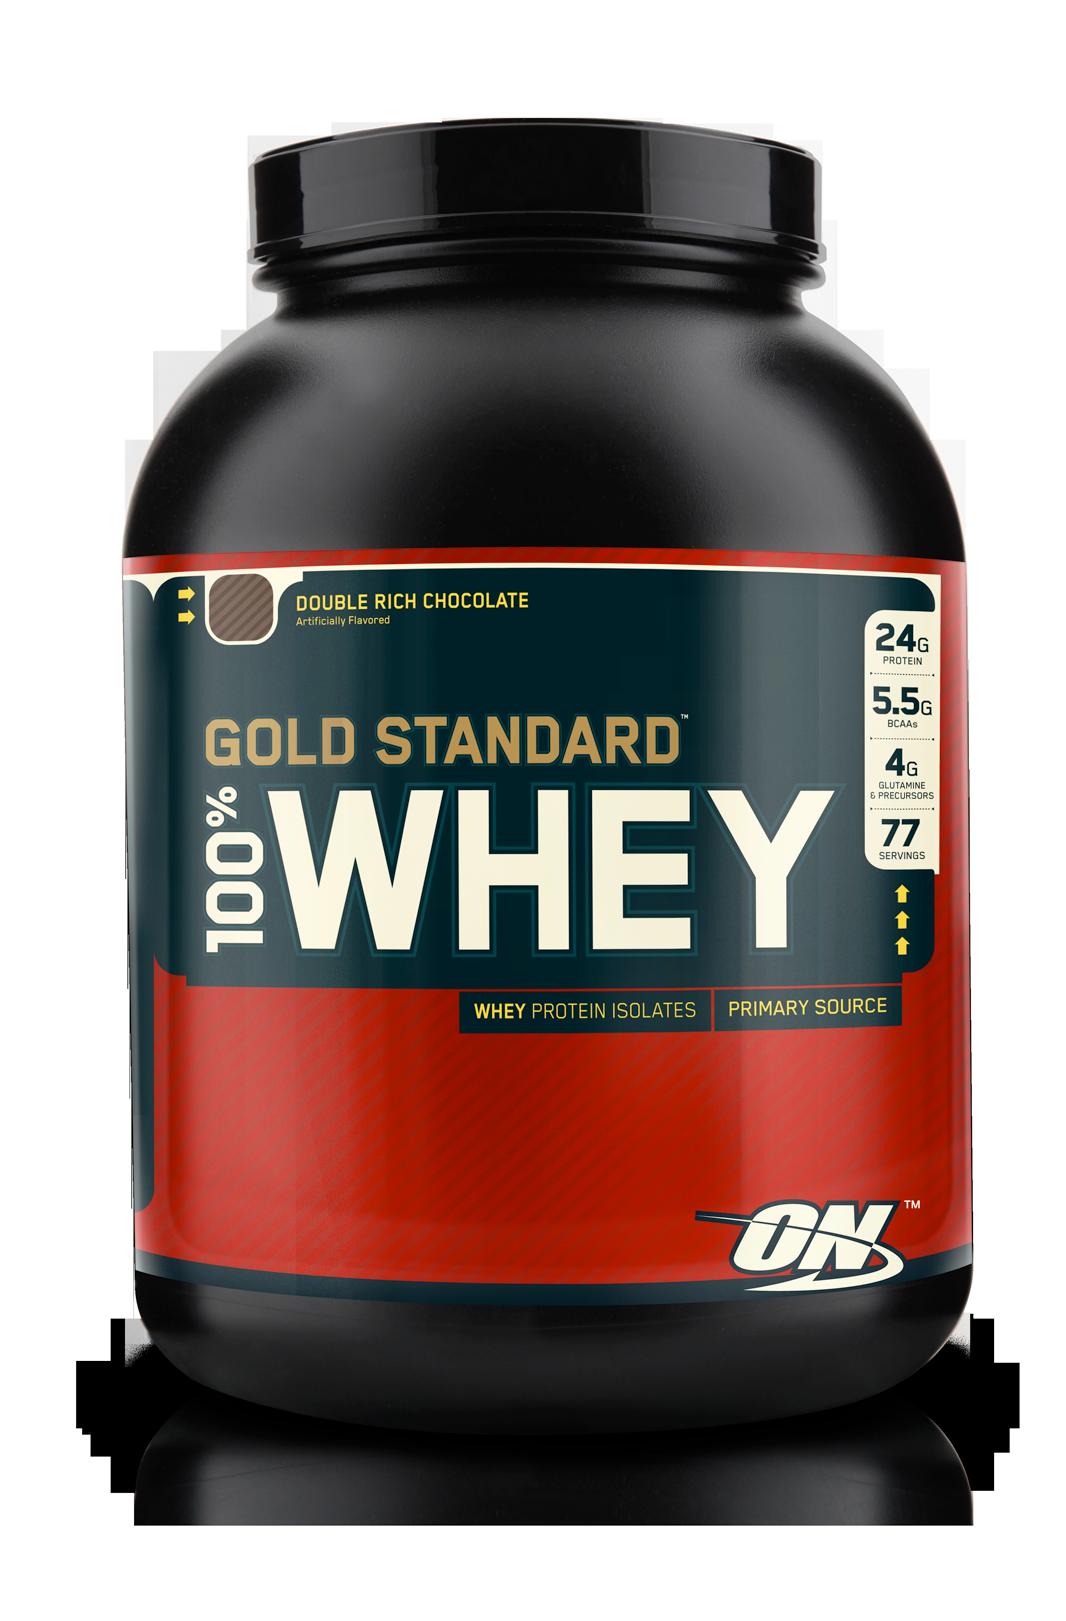 100 Whey Gold Standard 15 99 Optimum Nutrition True Strength Gold Standard Whey Gold Whey Protein Whey Protein